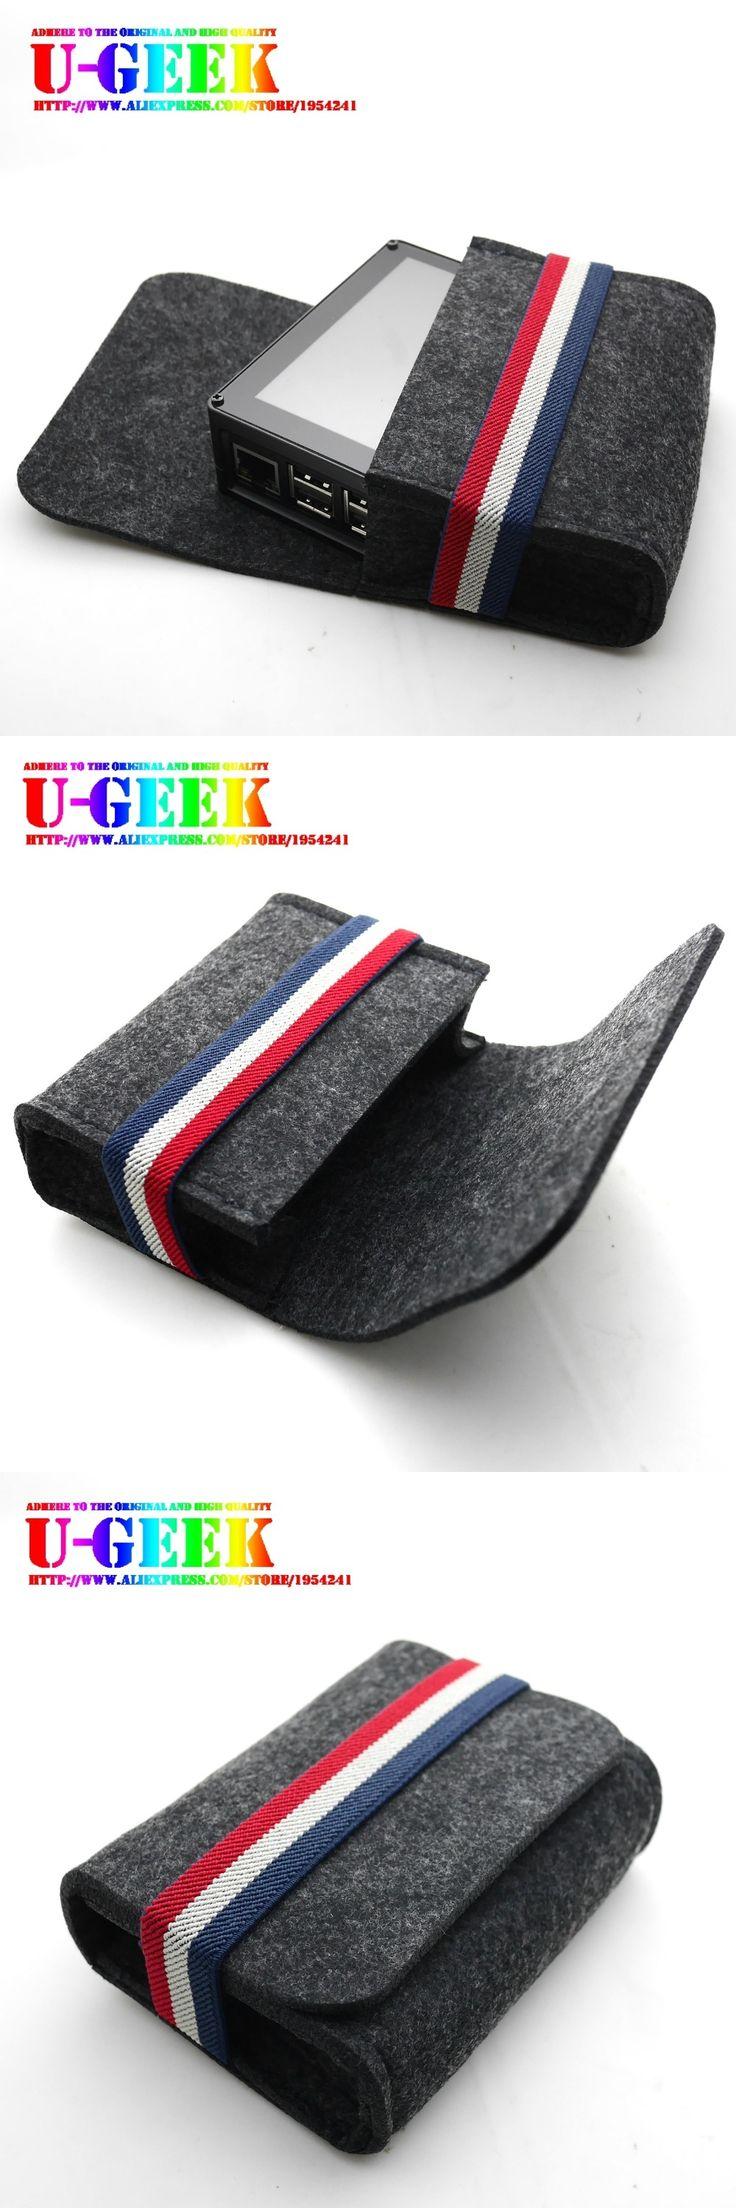 UGEEK AOIDE Wool felt-like bag for 3.5 inch screen CNC / Acrylic case kit  Raspberry Pi case 